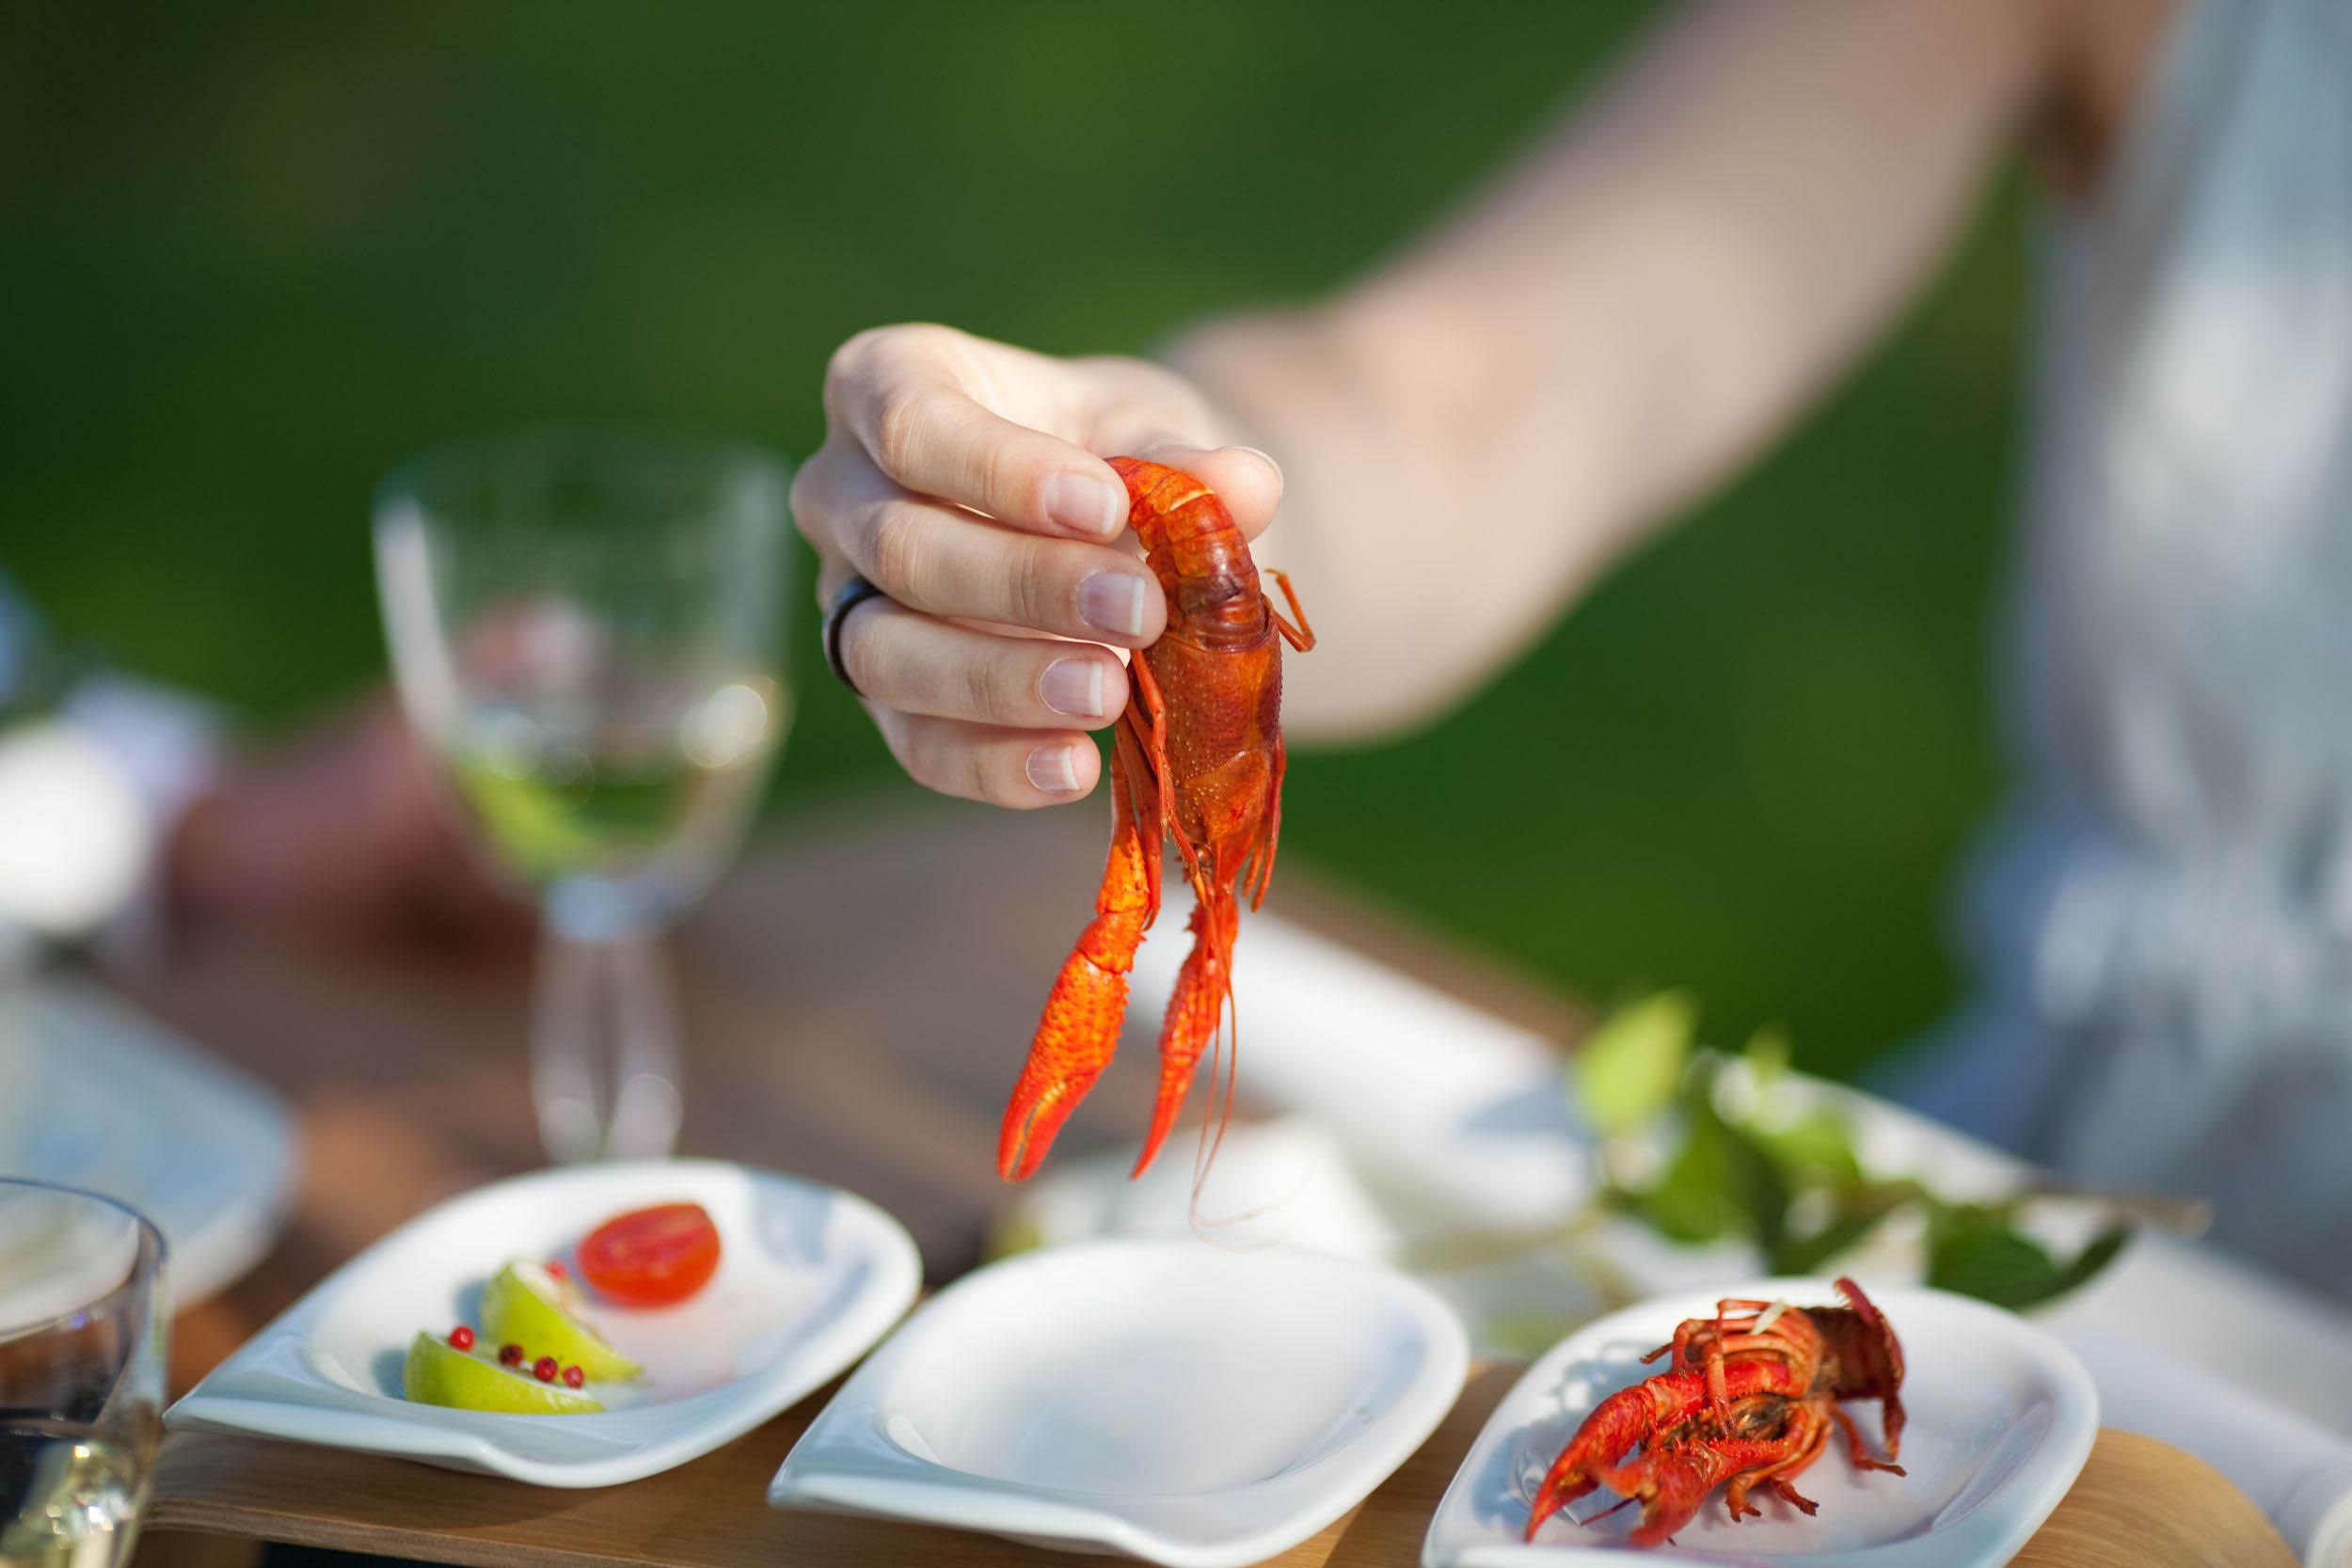 dining-on-crayfish